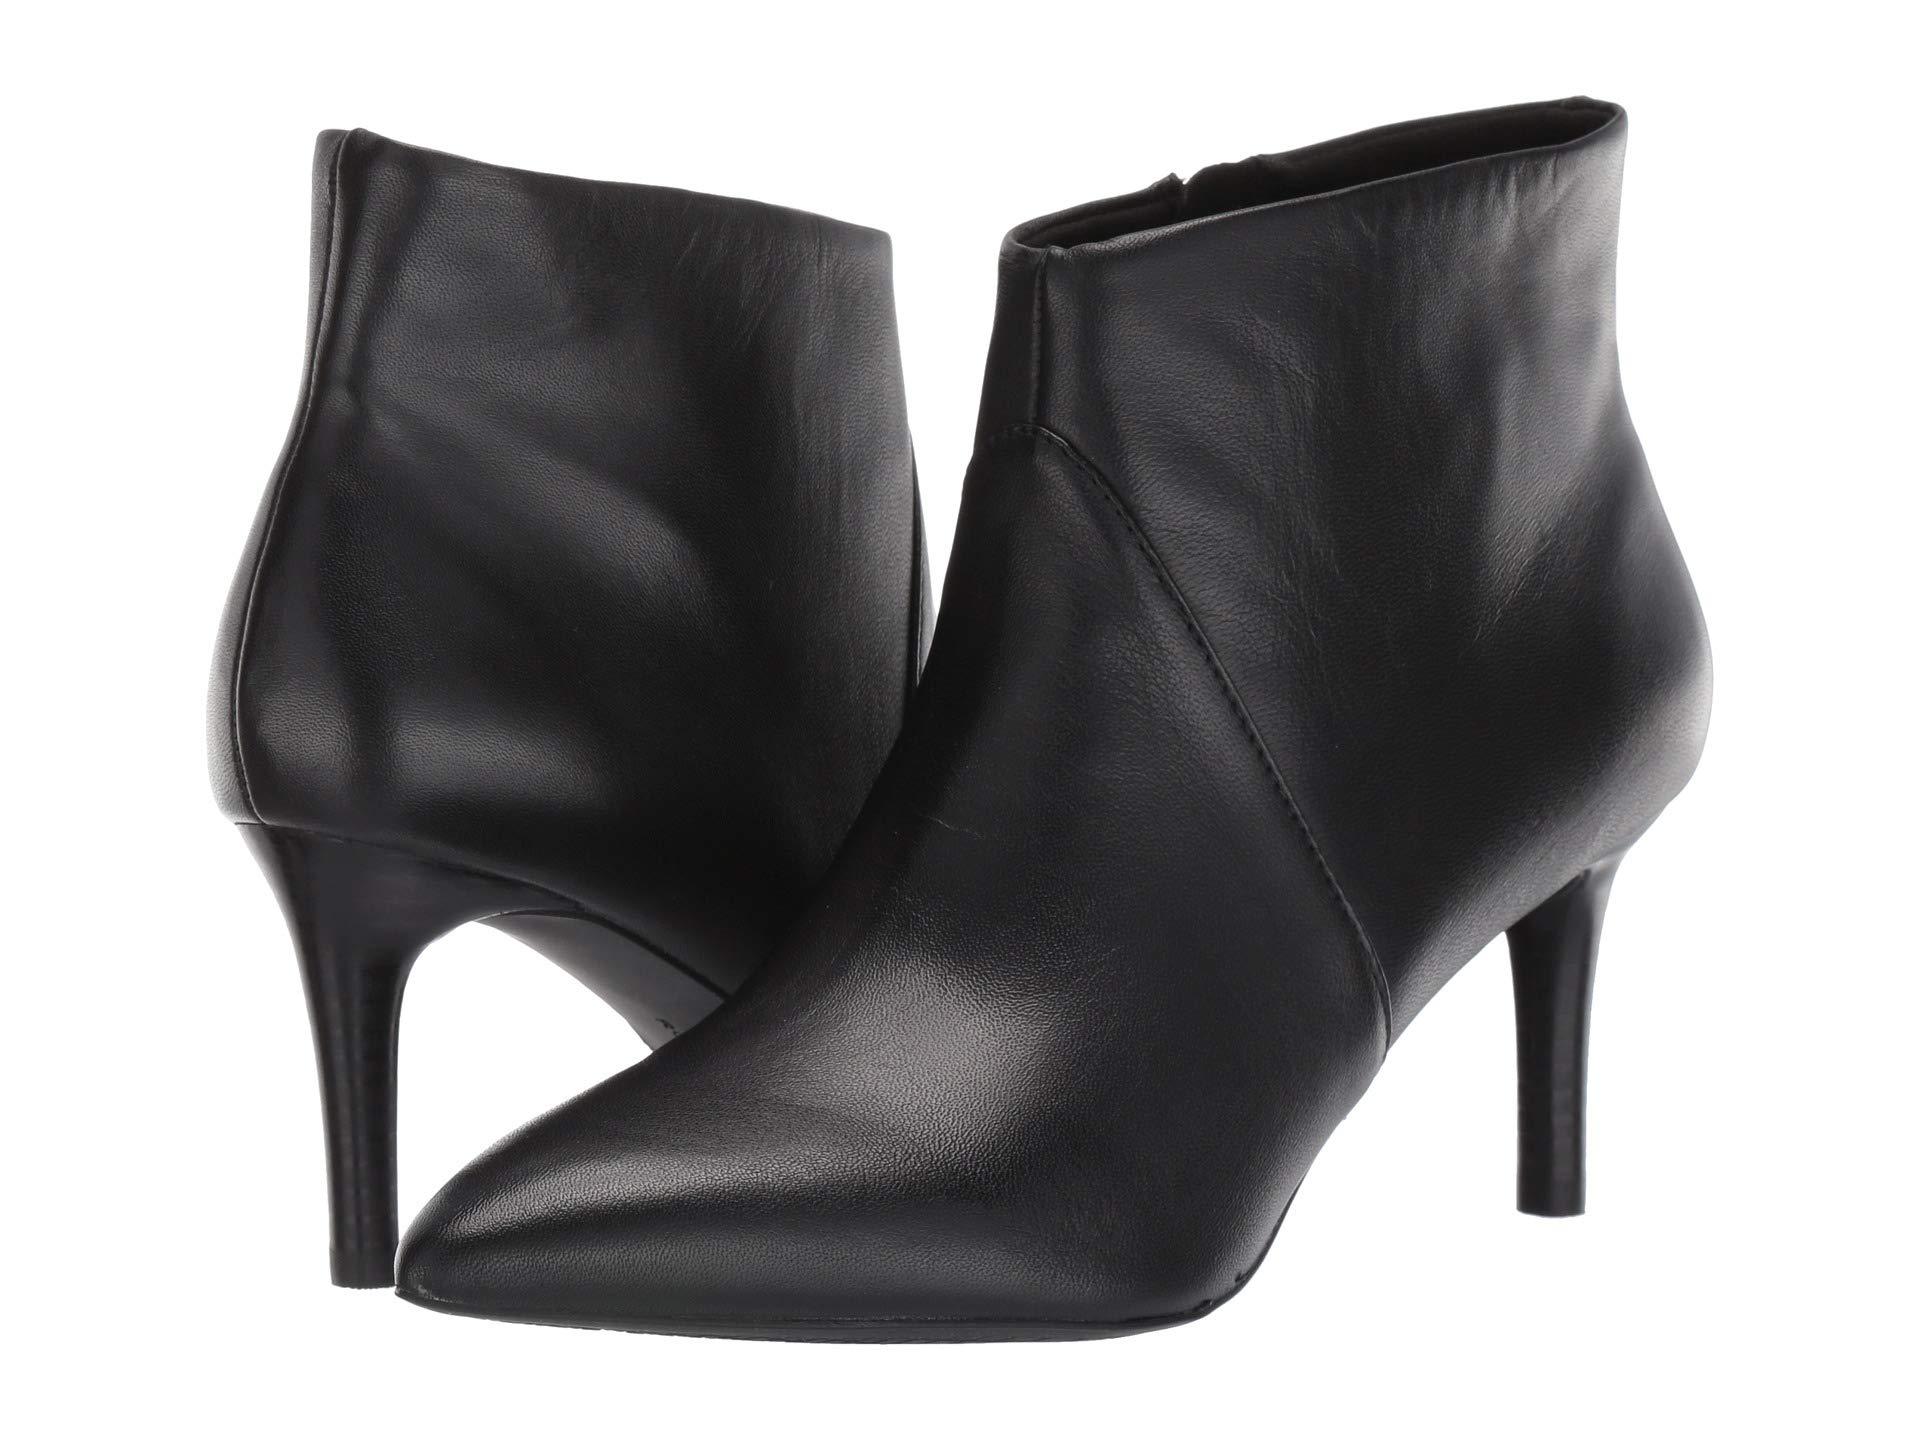 Rockport Rockport Total Motion Ariahnna Plain Ankle Boot